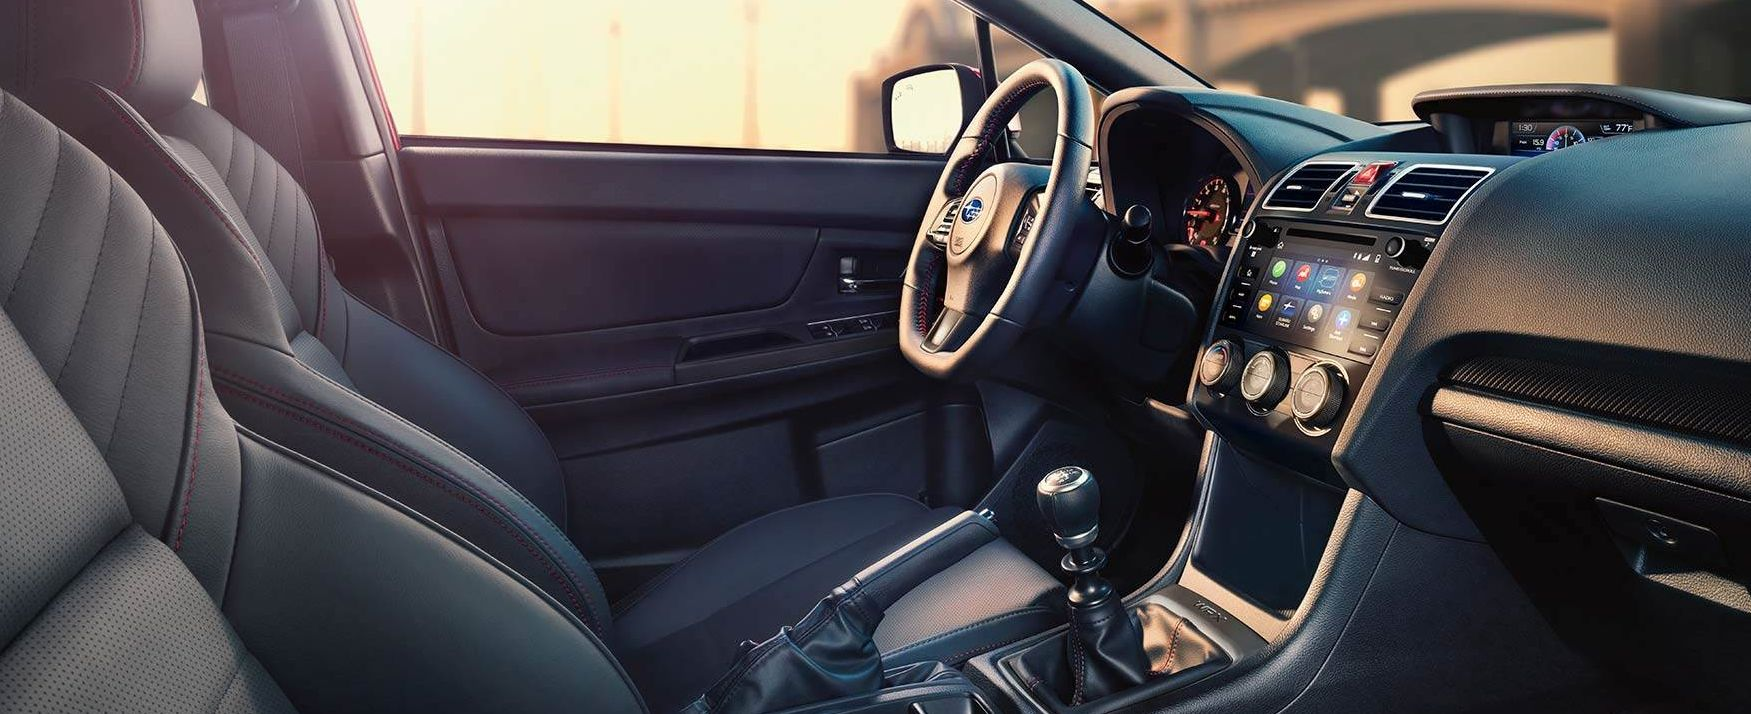 Interior of the 2018 Subaru WRX